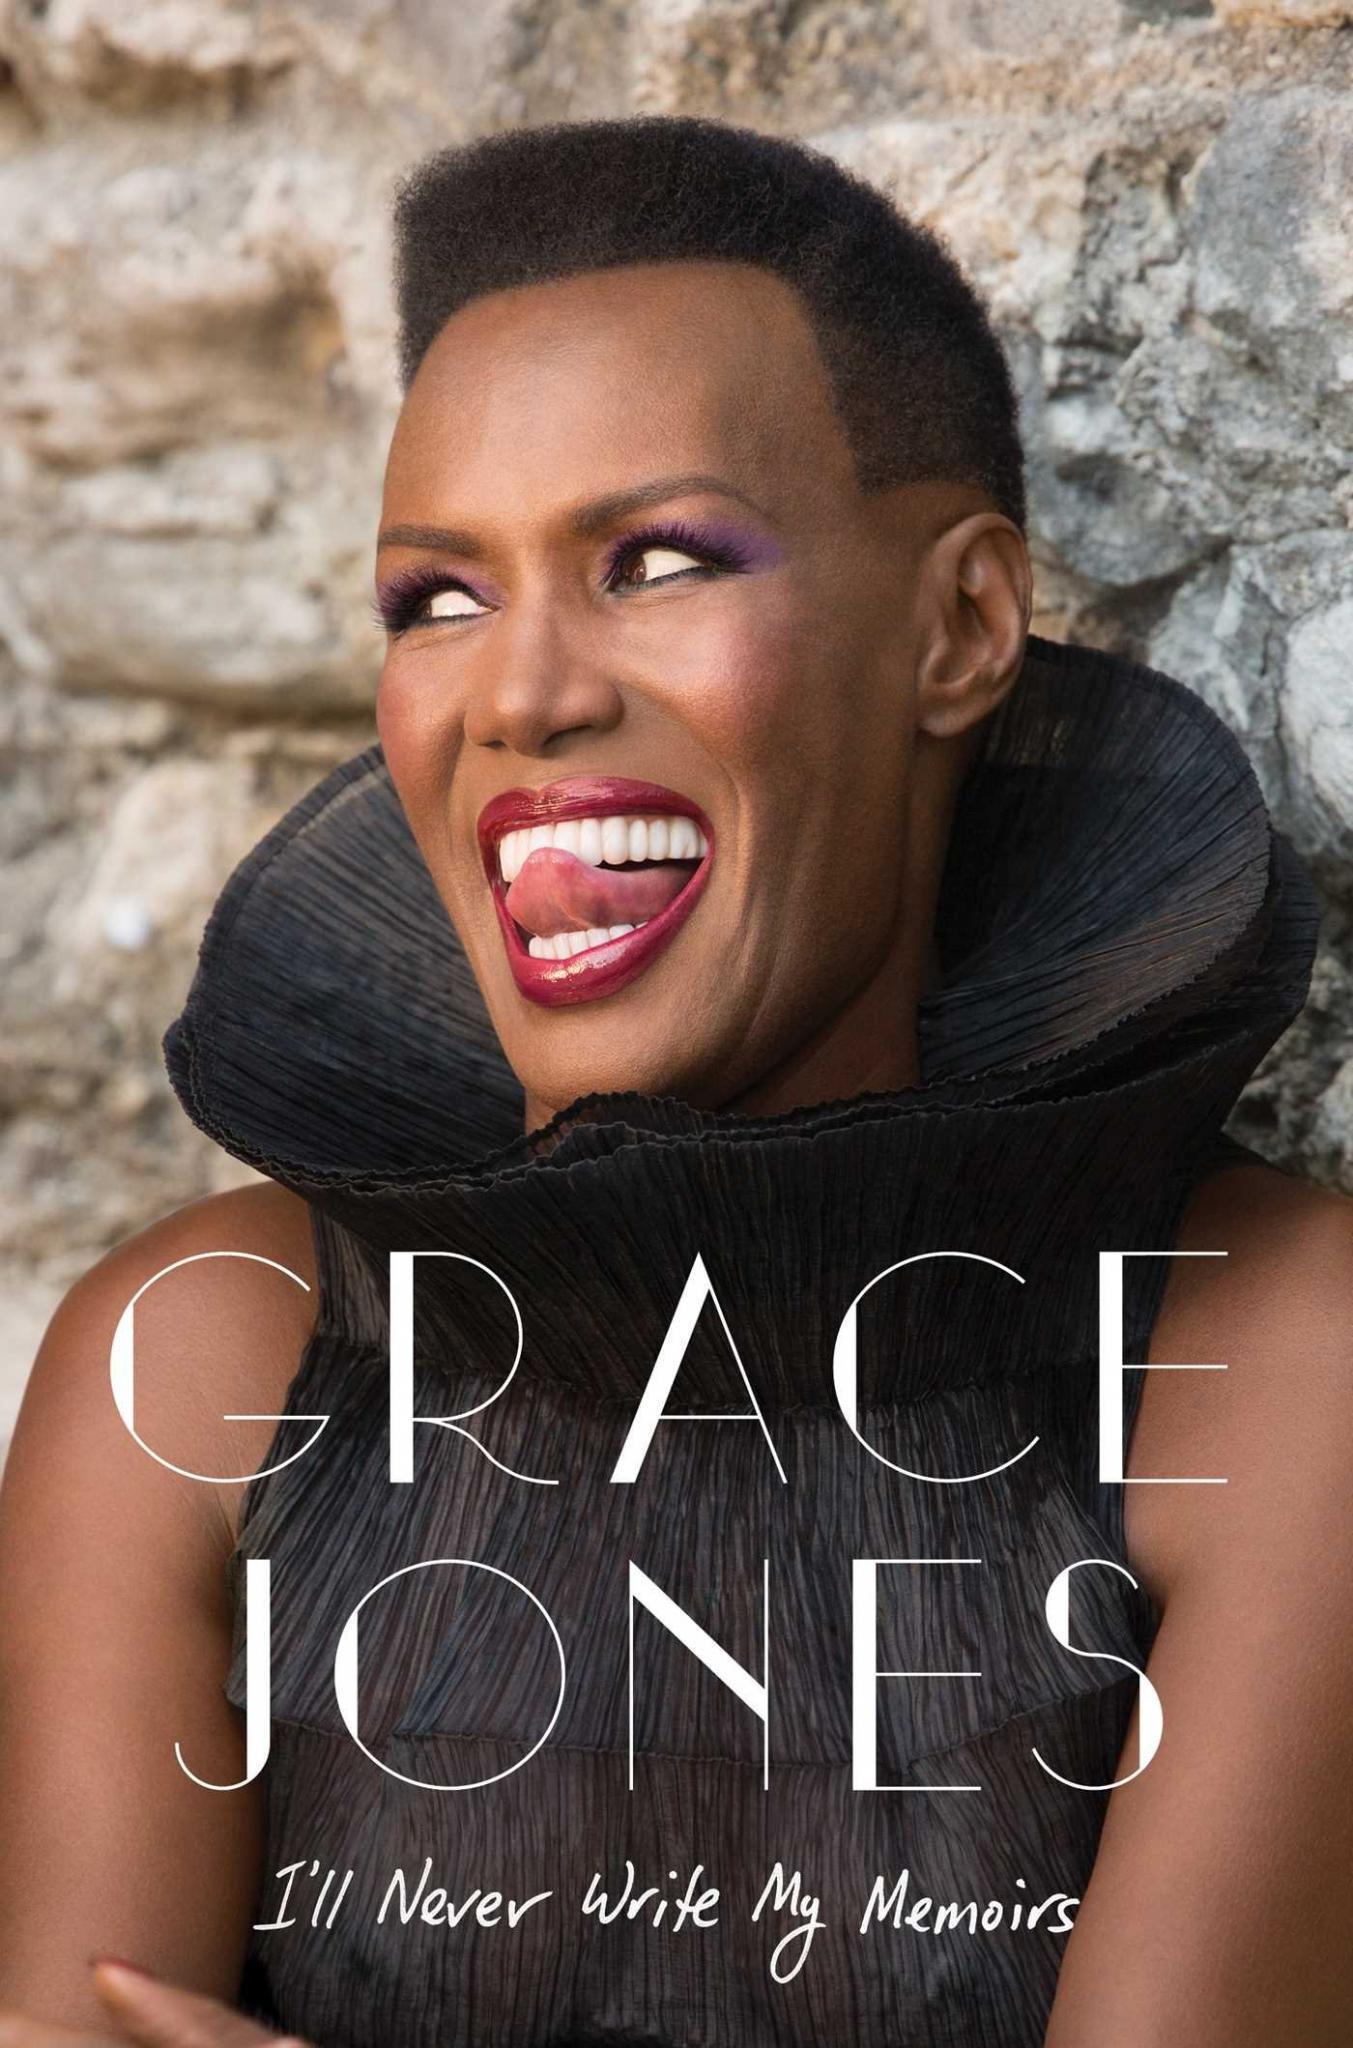 Grace Jones Looks Back At Her Colorful Life in Sizzling New Memoir